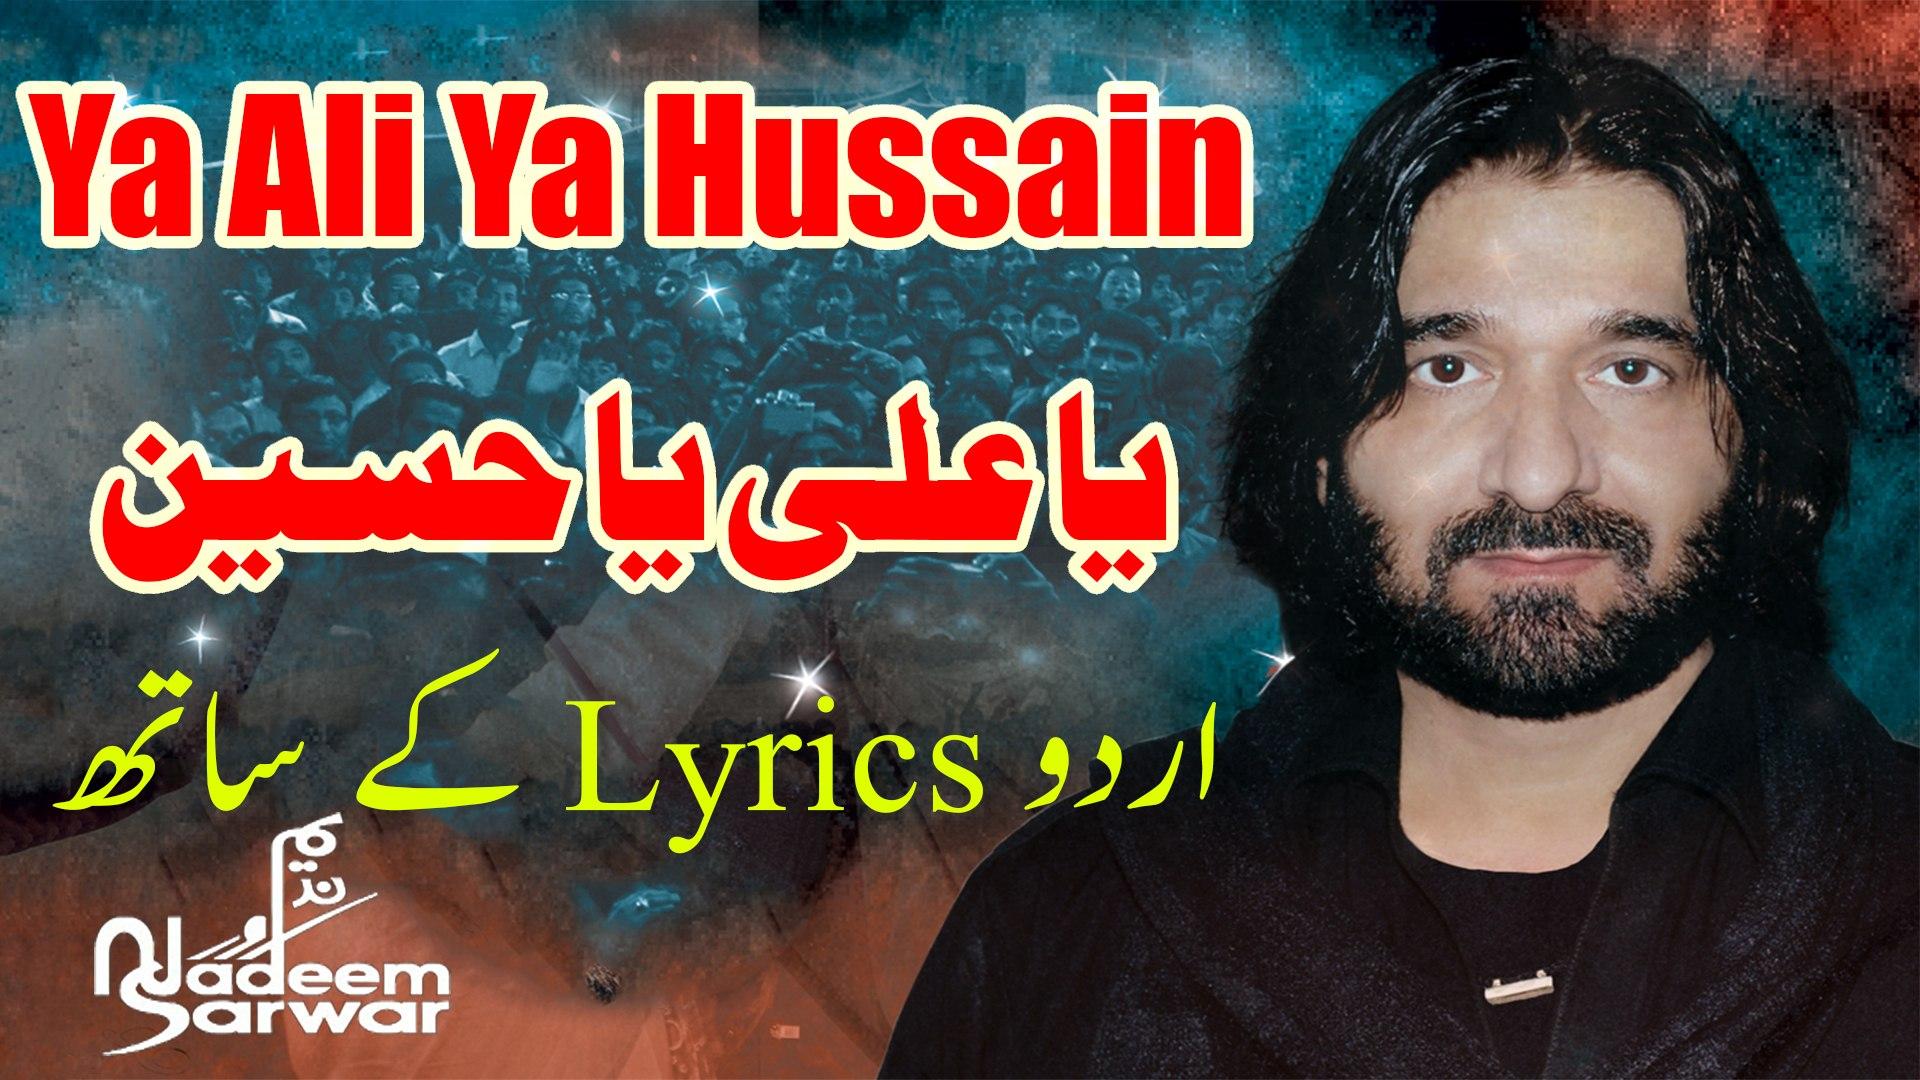 Ya Ali Ya Hussain - Nadeem Sarwar Noha 2009 With Lyrics